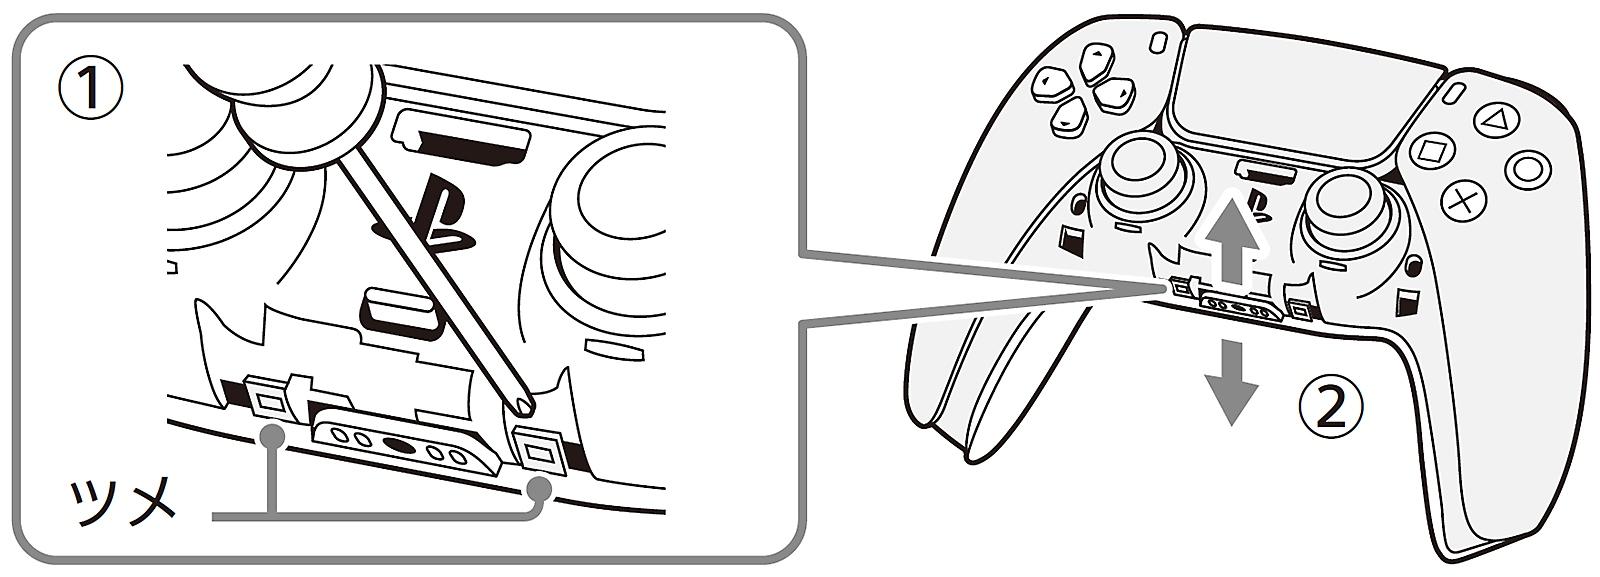 DS4-image-block-remove-battery-03-ja-jp-20jan21.png